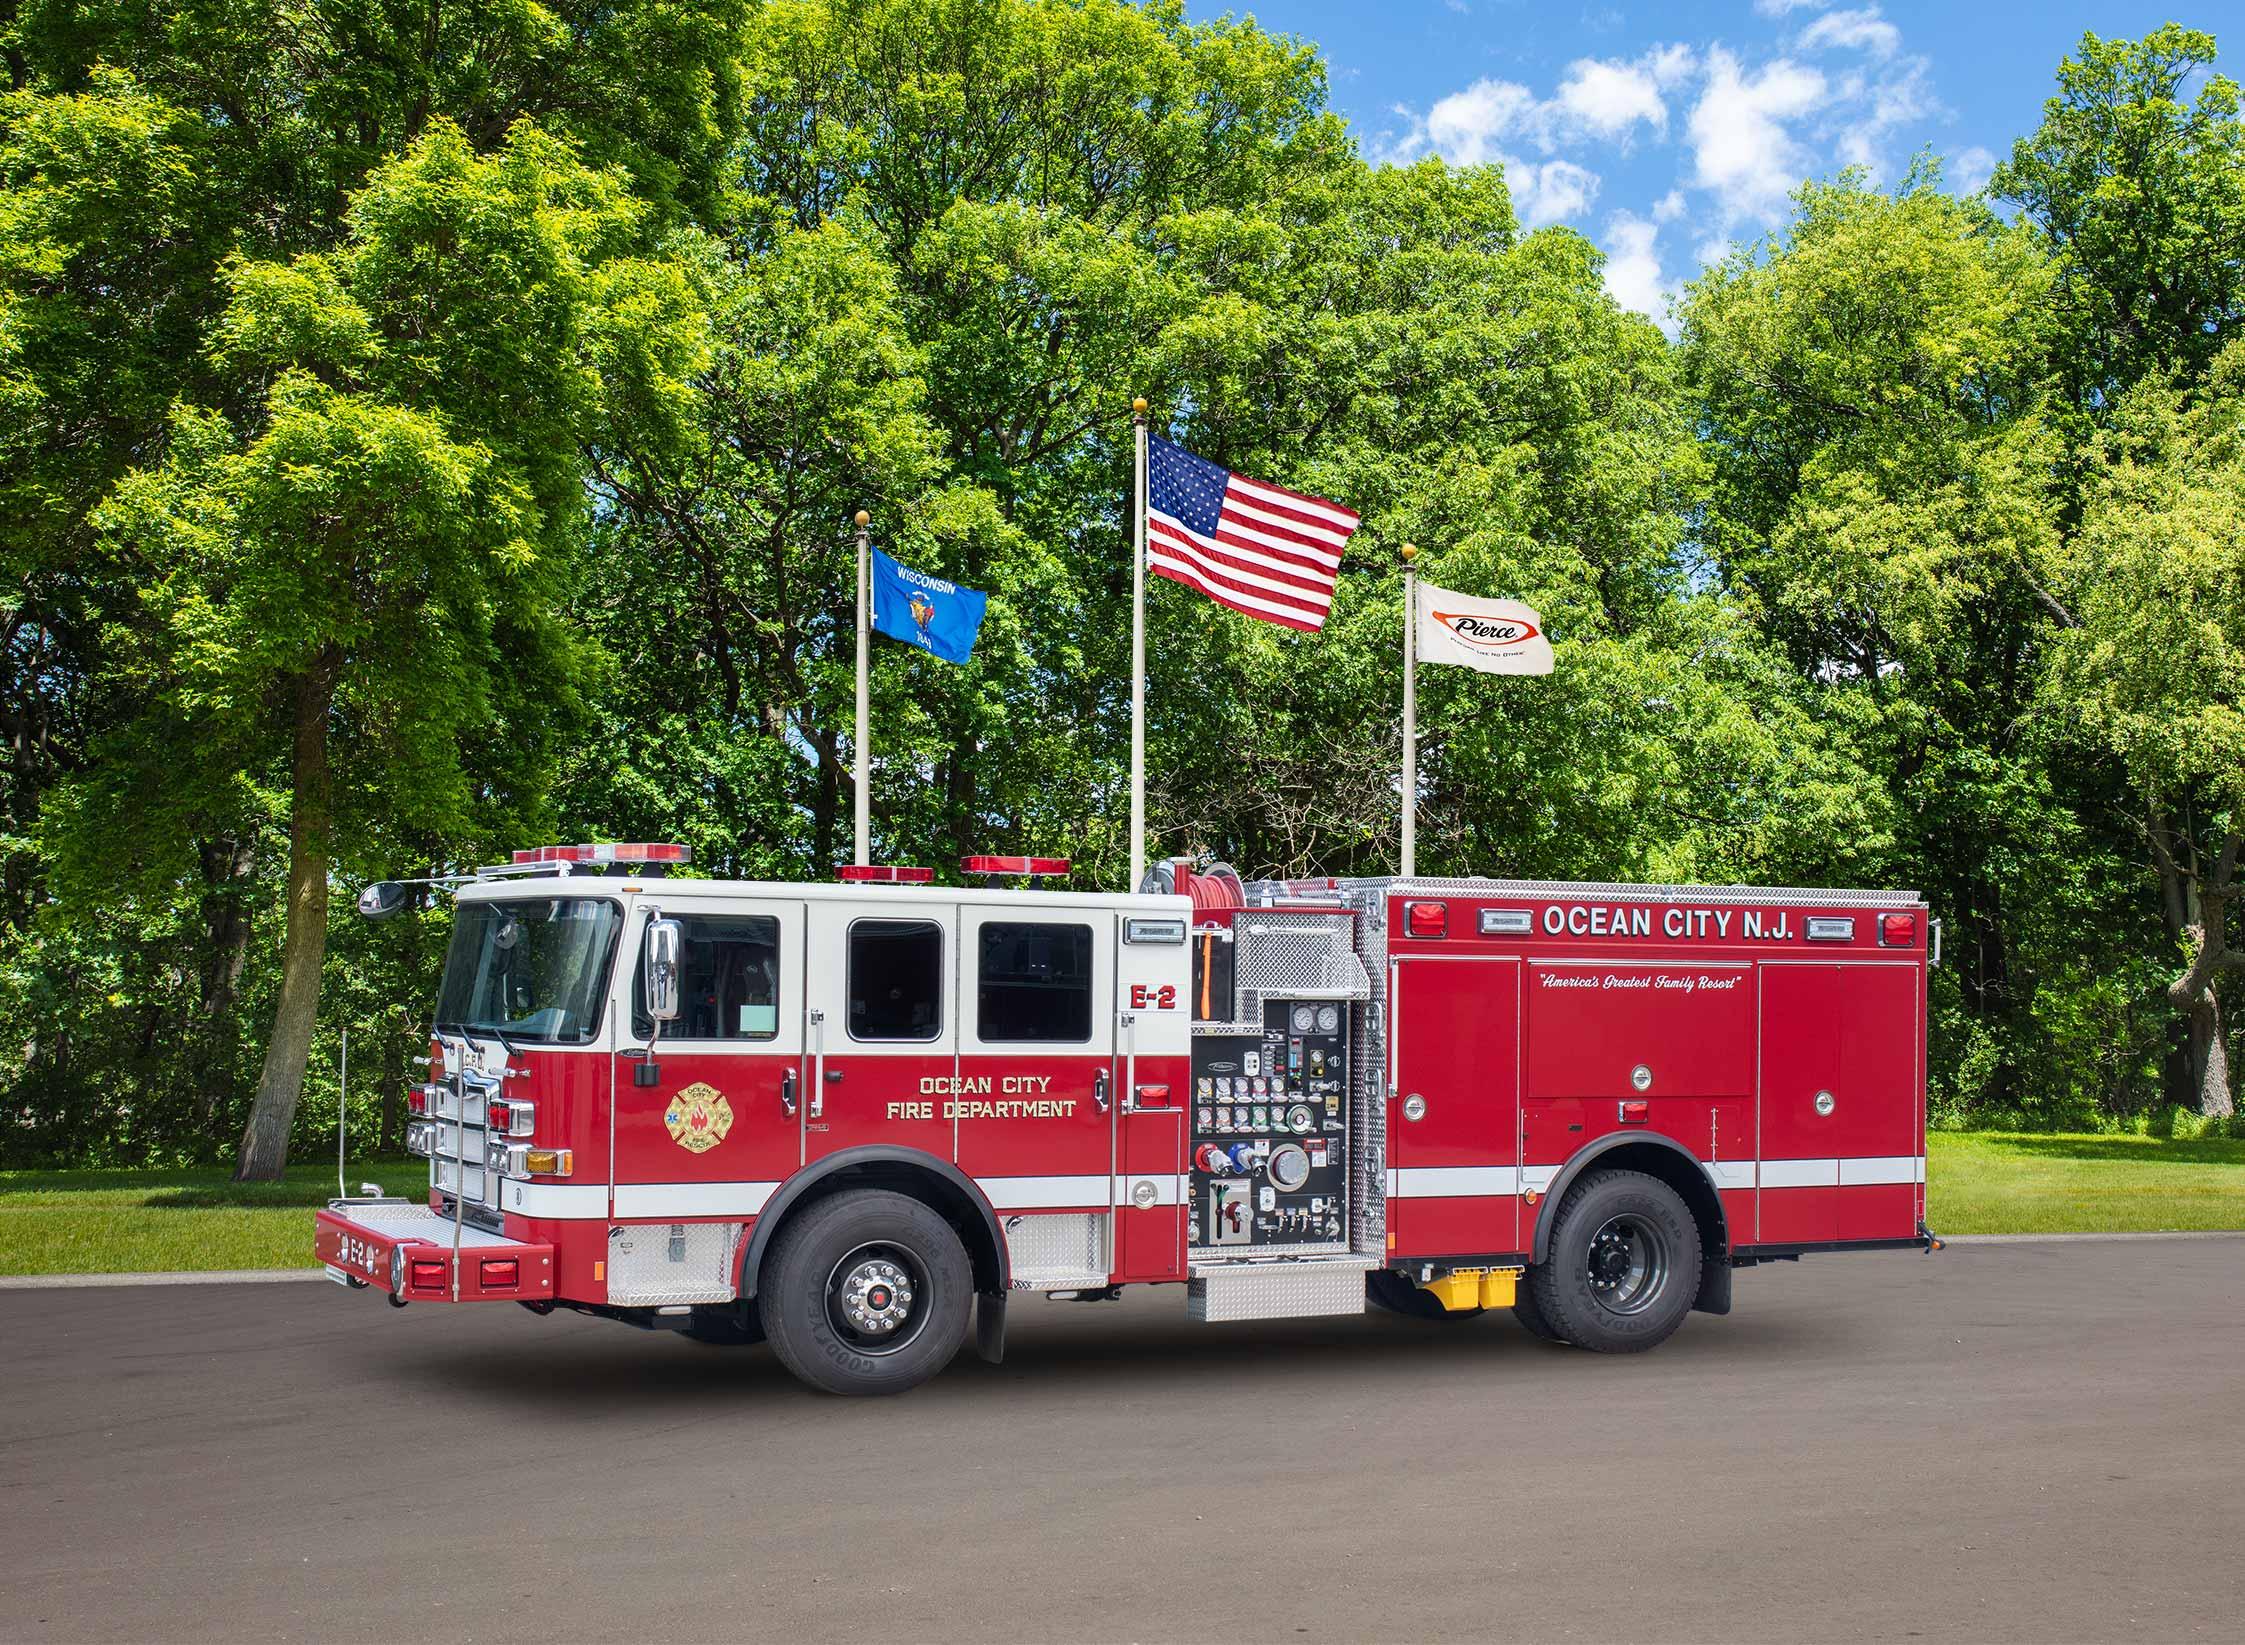 Ocean City Fire Department - Pumper